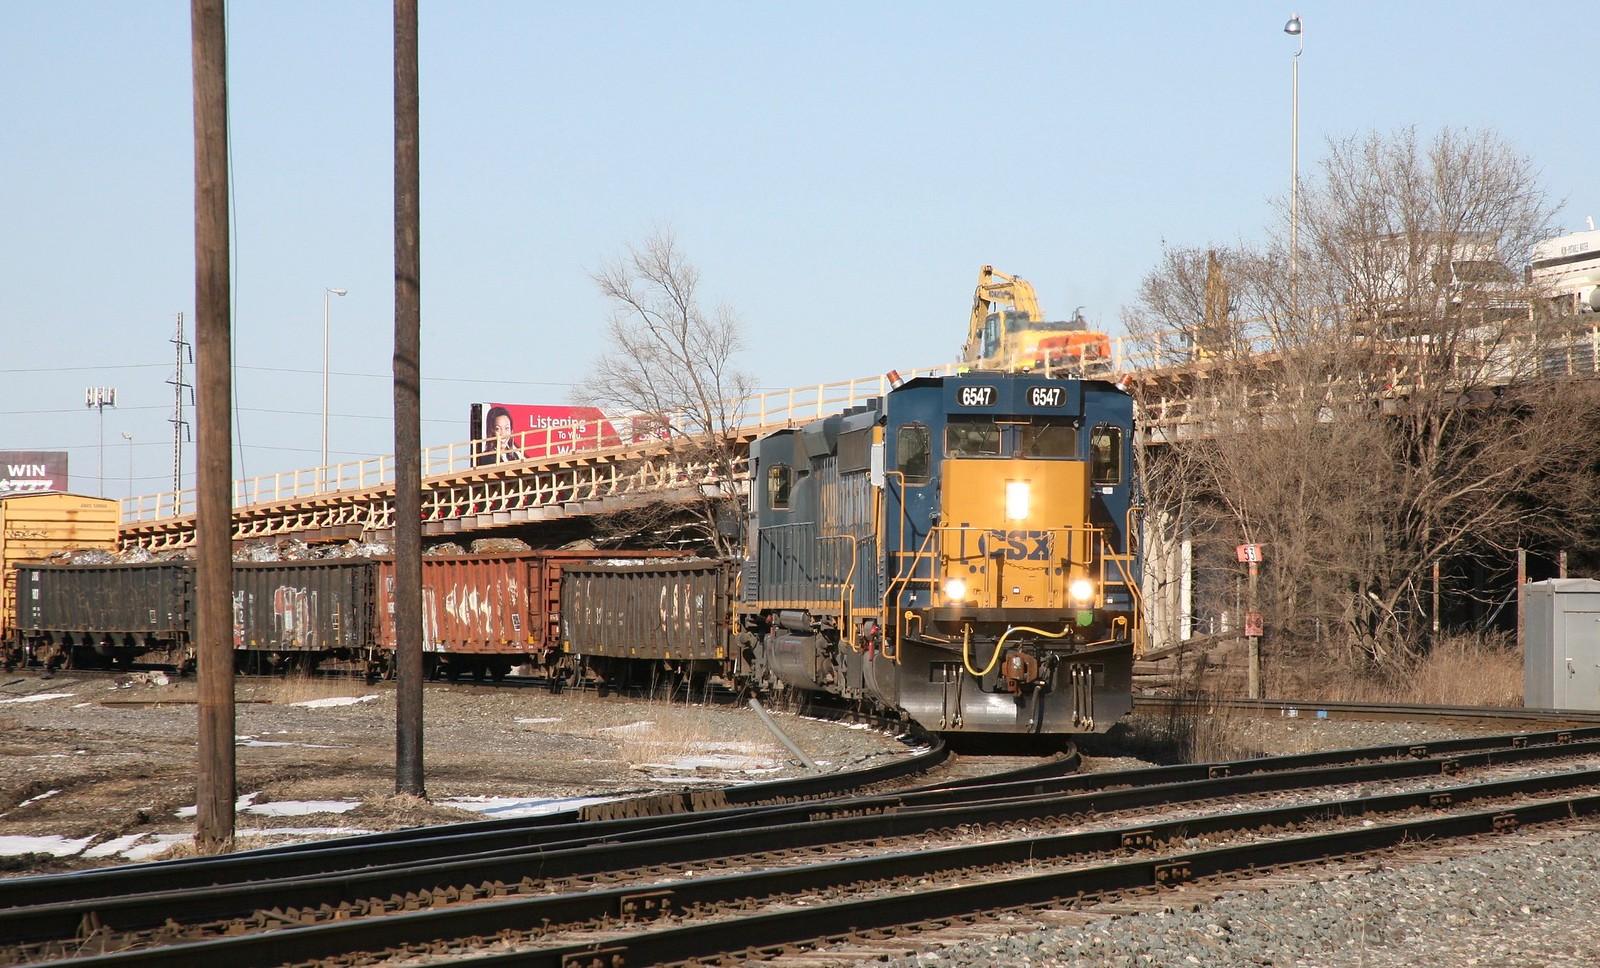 Detroit Railfanning - Page 20 - Model Train Journal